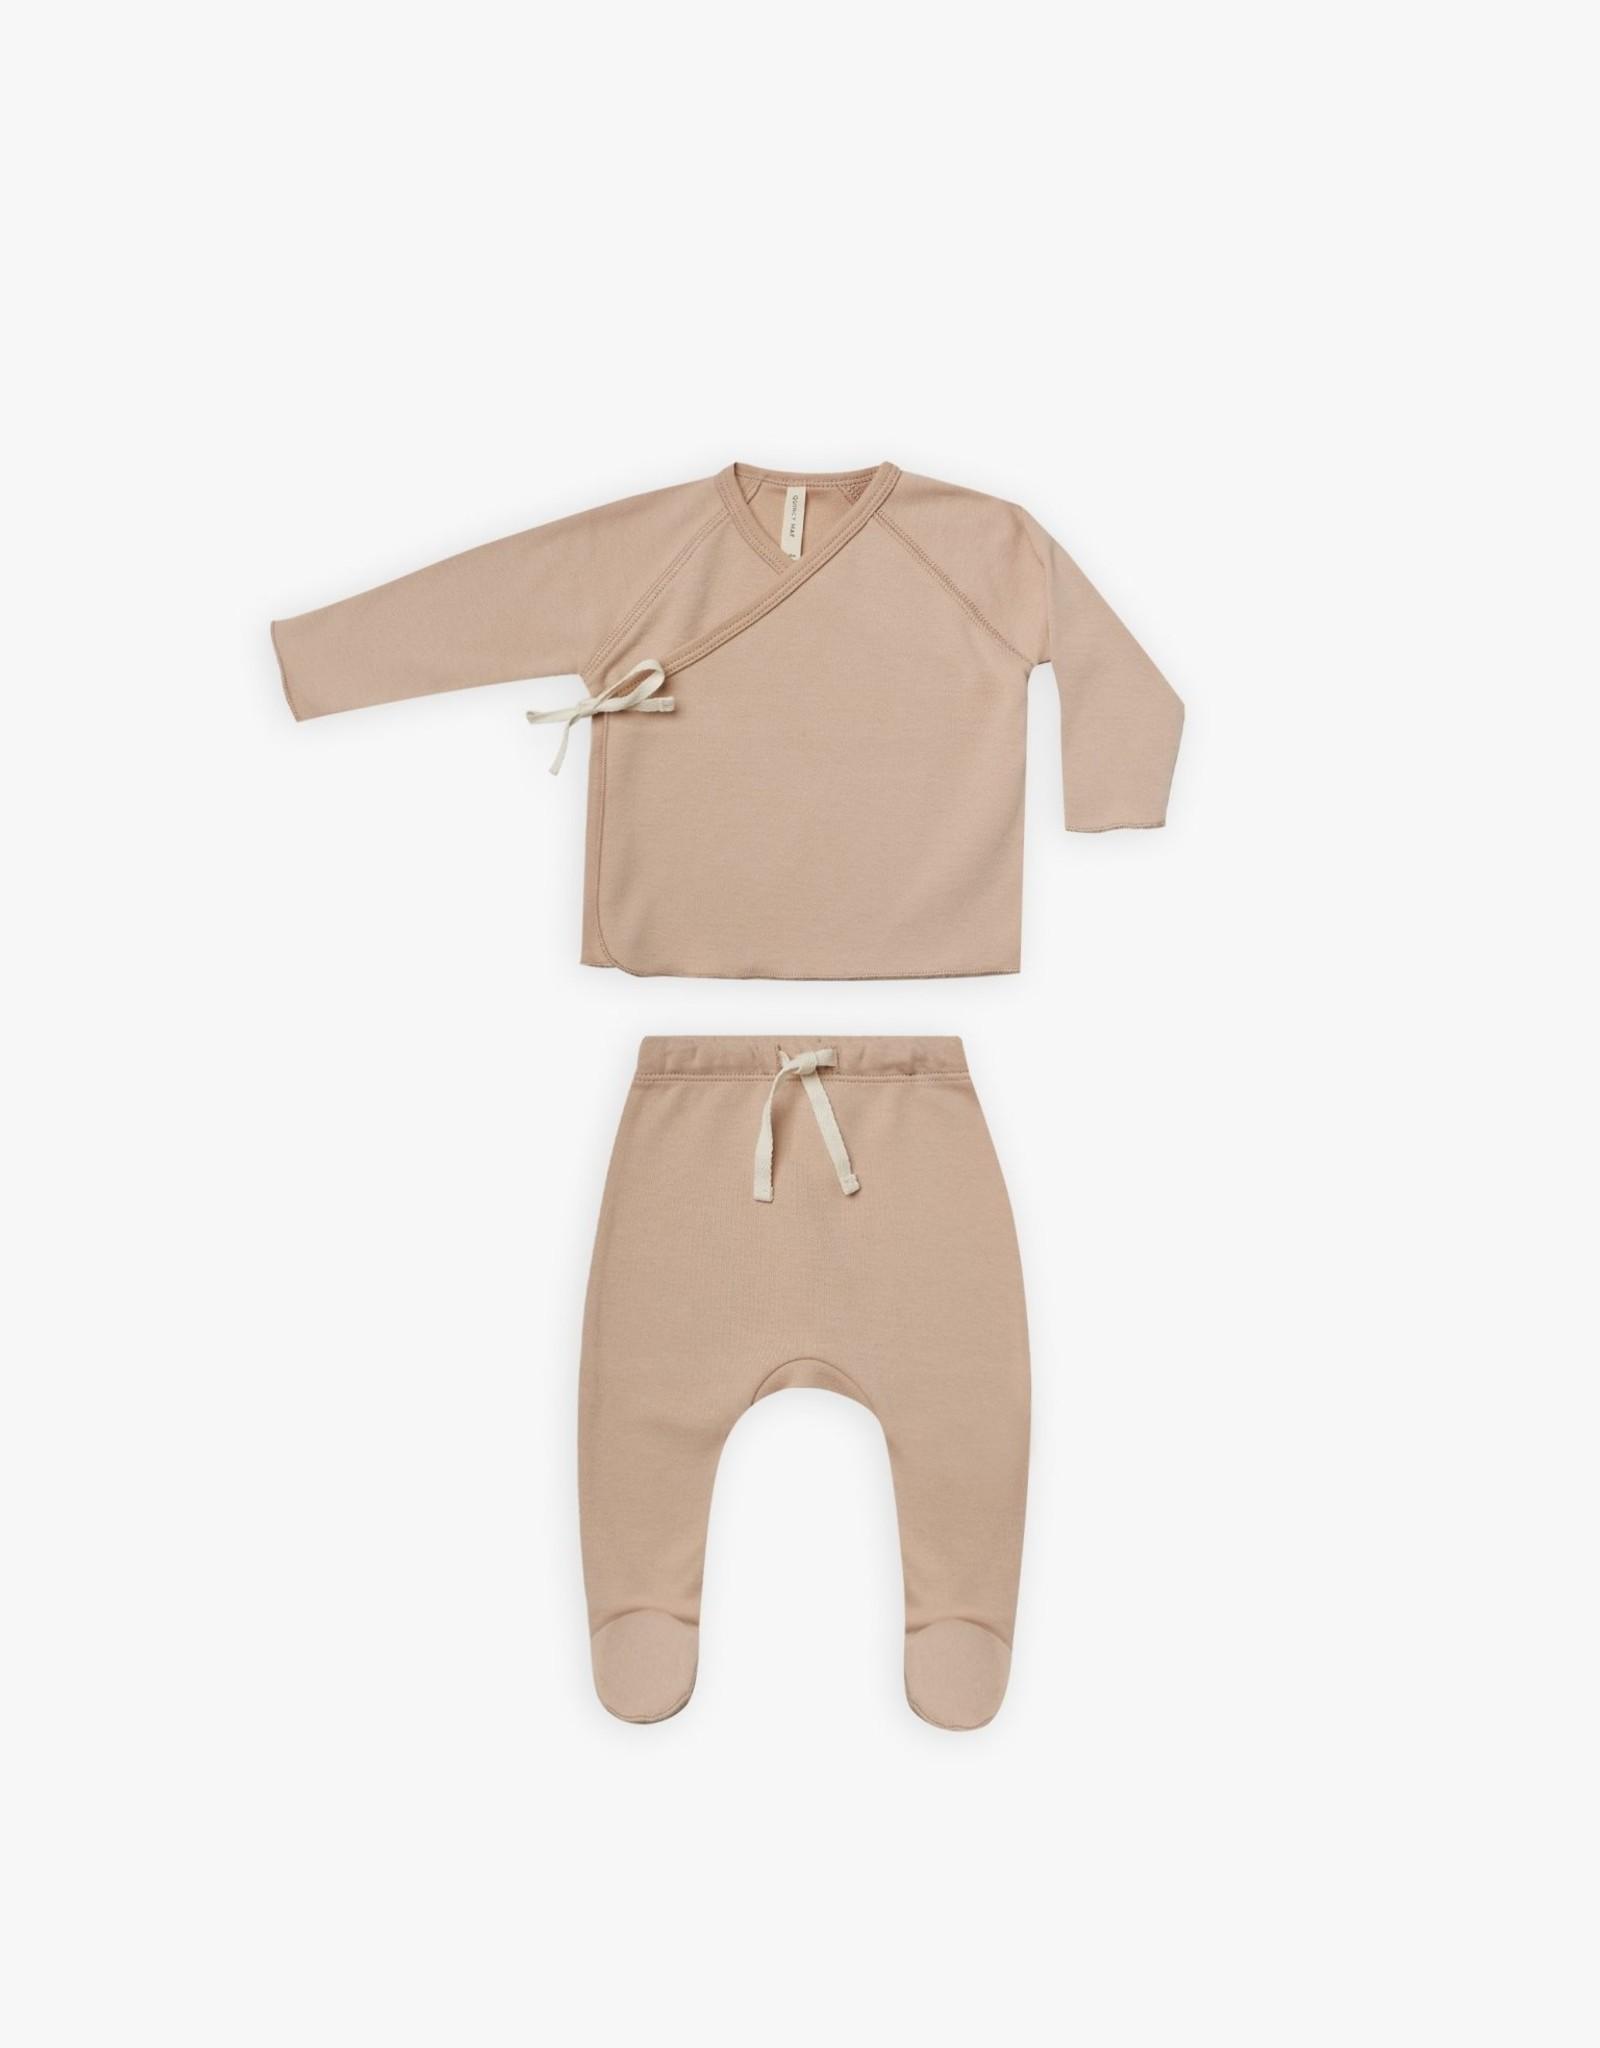 Quincy Mae Wrap Top and Pant Set, Petal